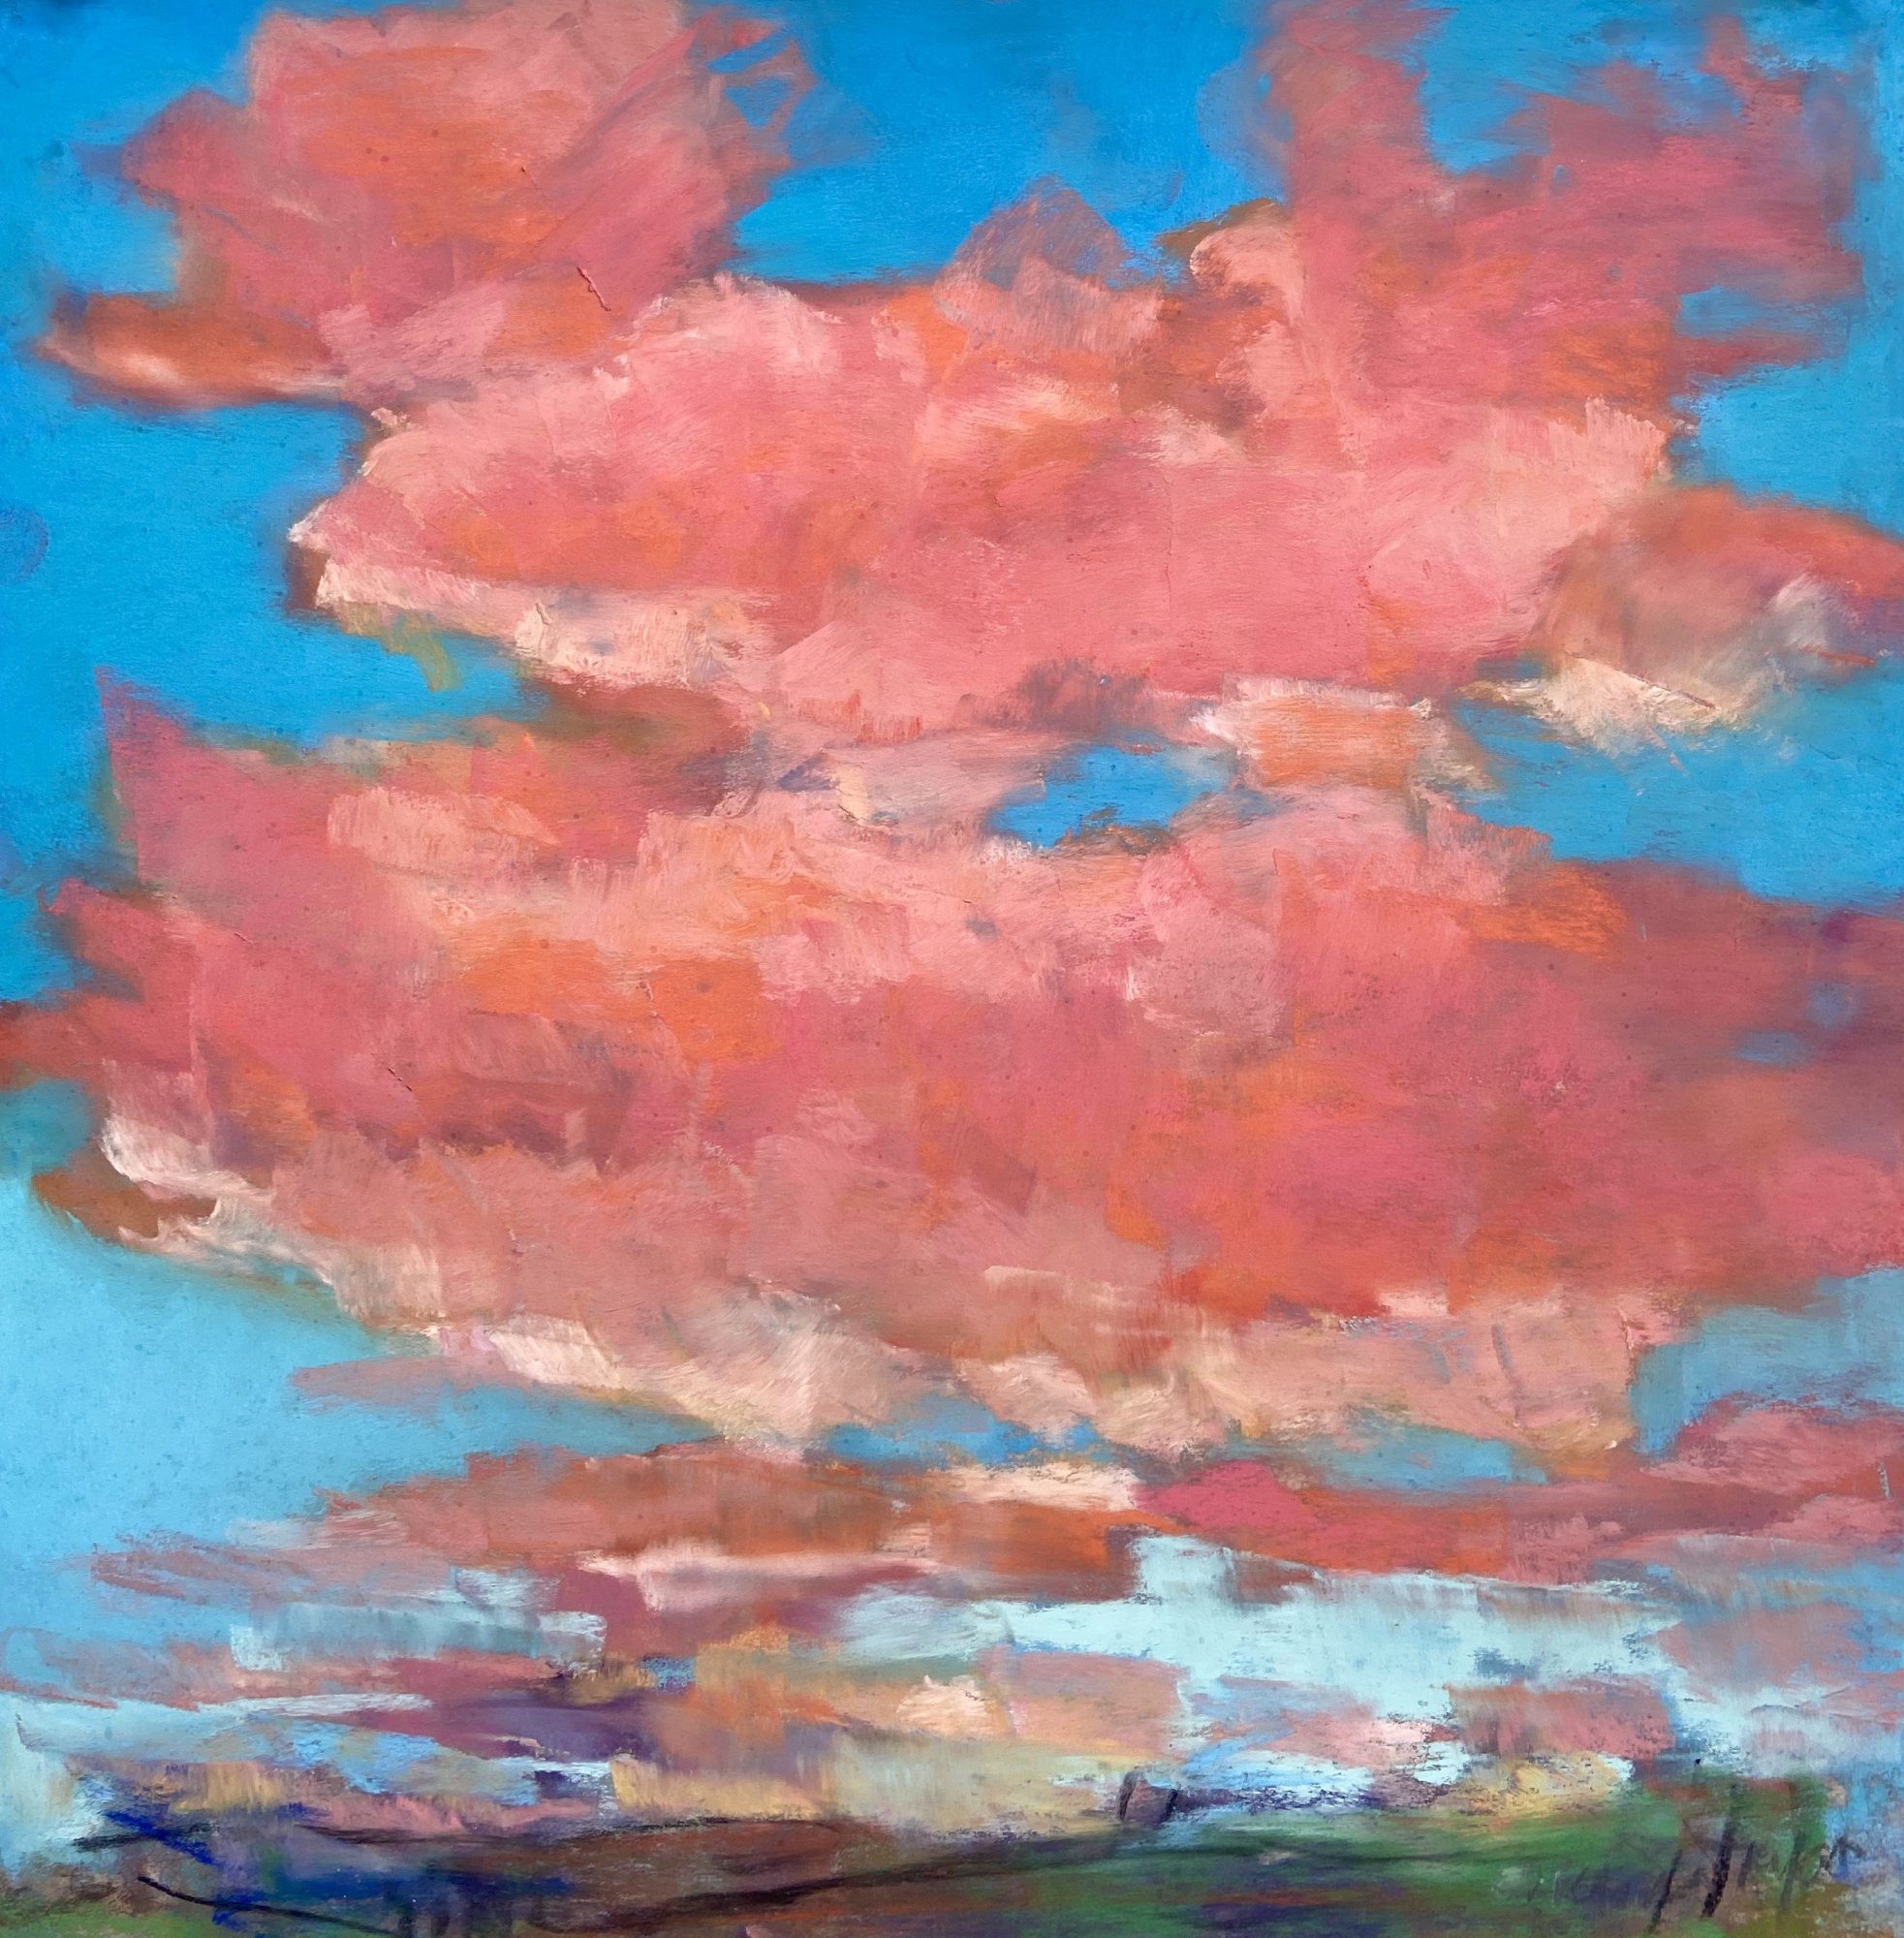 Turbulent Pink #2